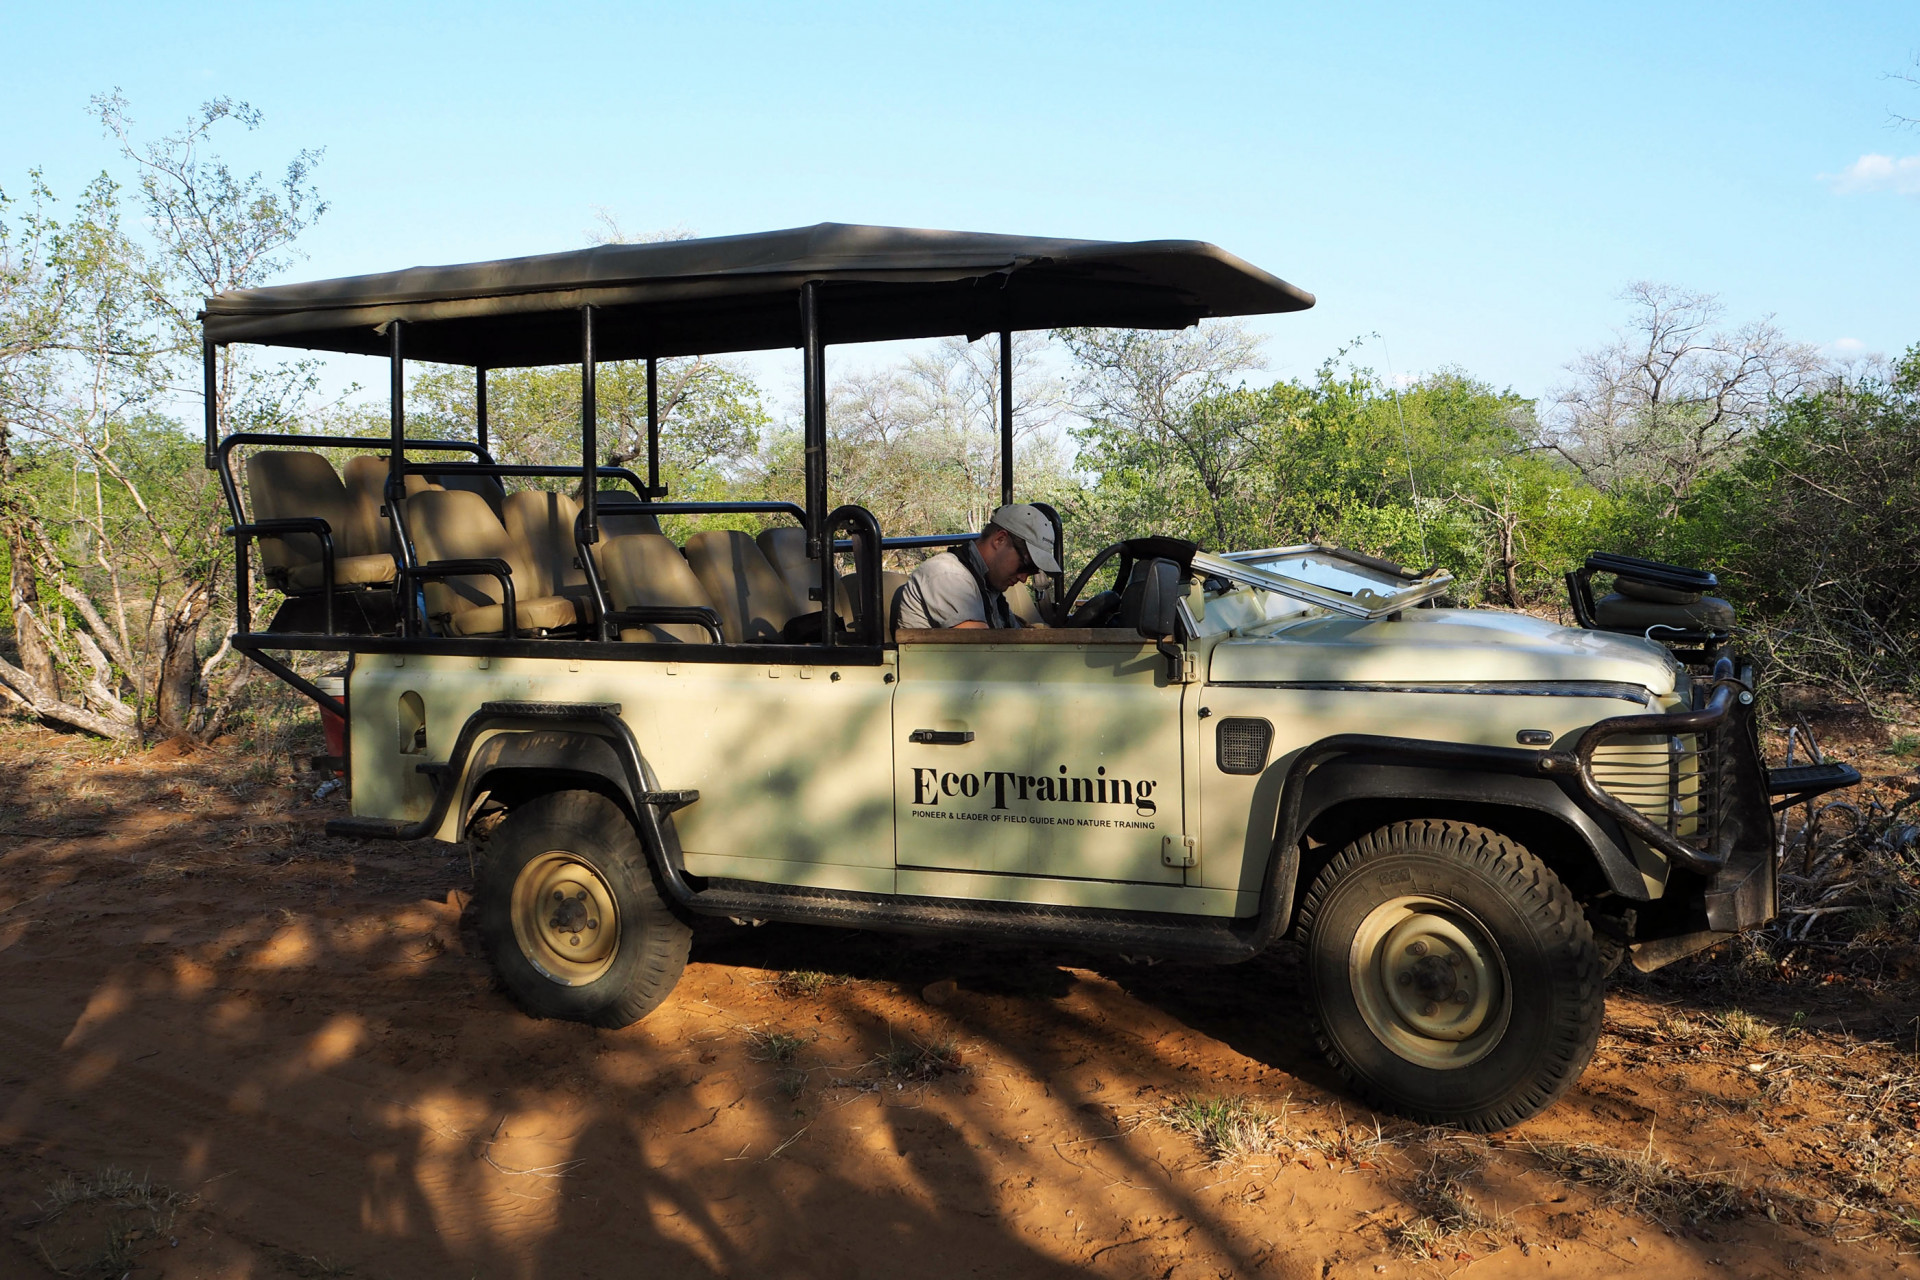 Ecotraining Jeep